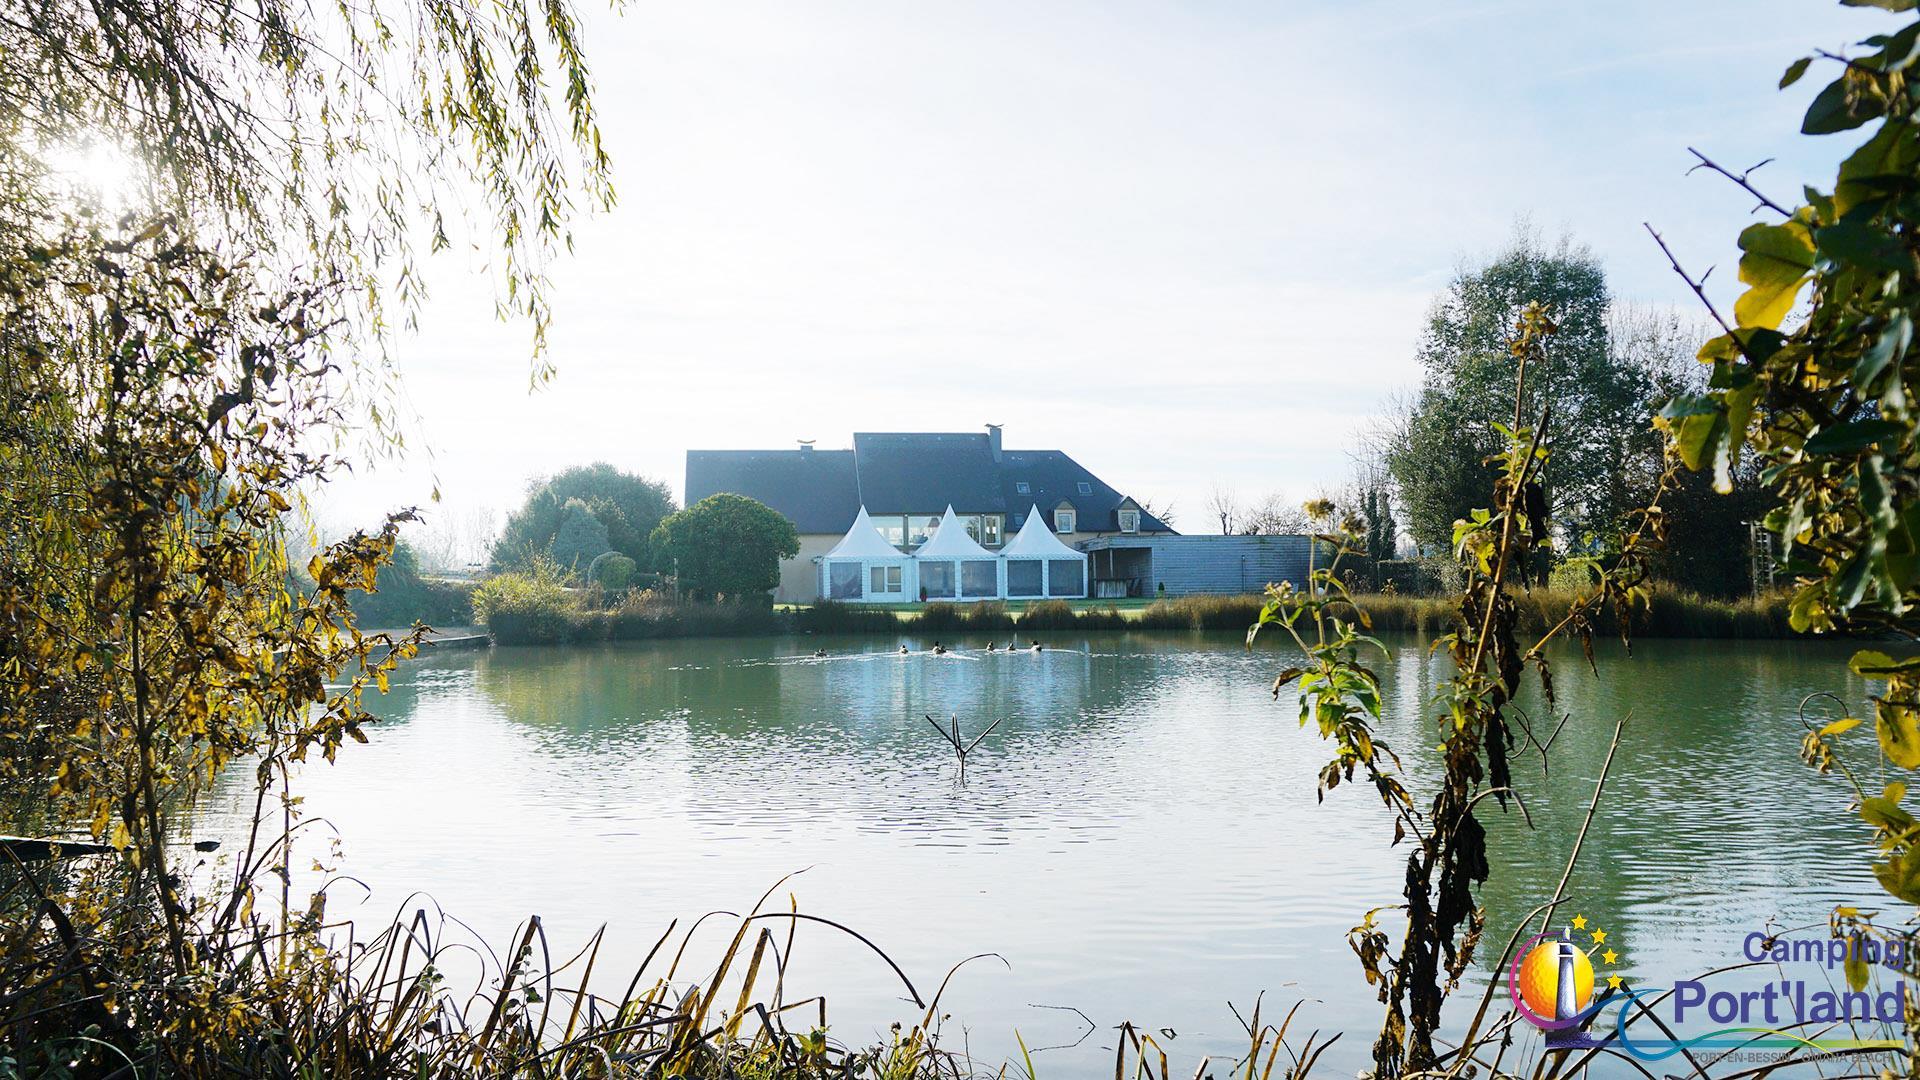 Camping Port'land, Port-en-Bessin-Huppain, Calvados